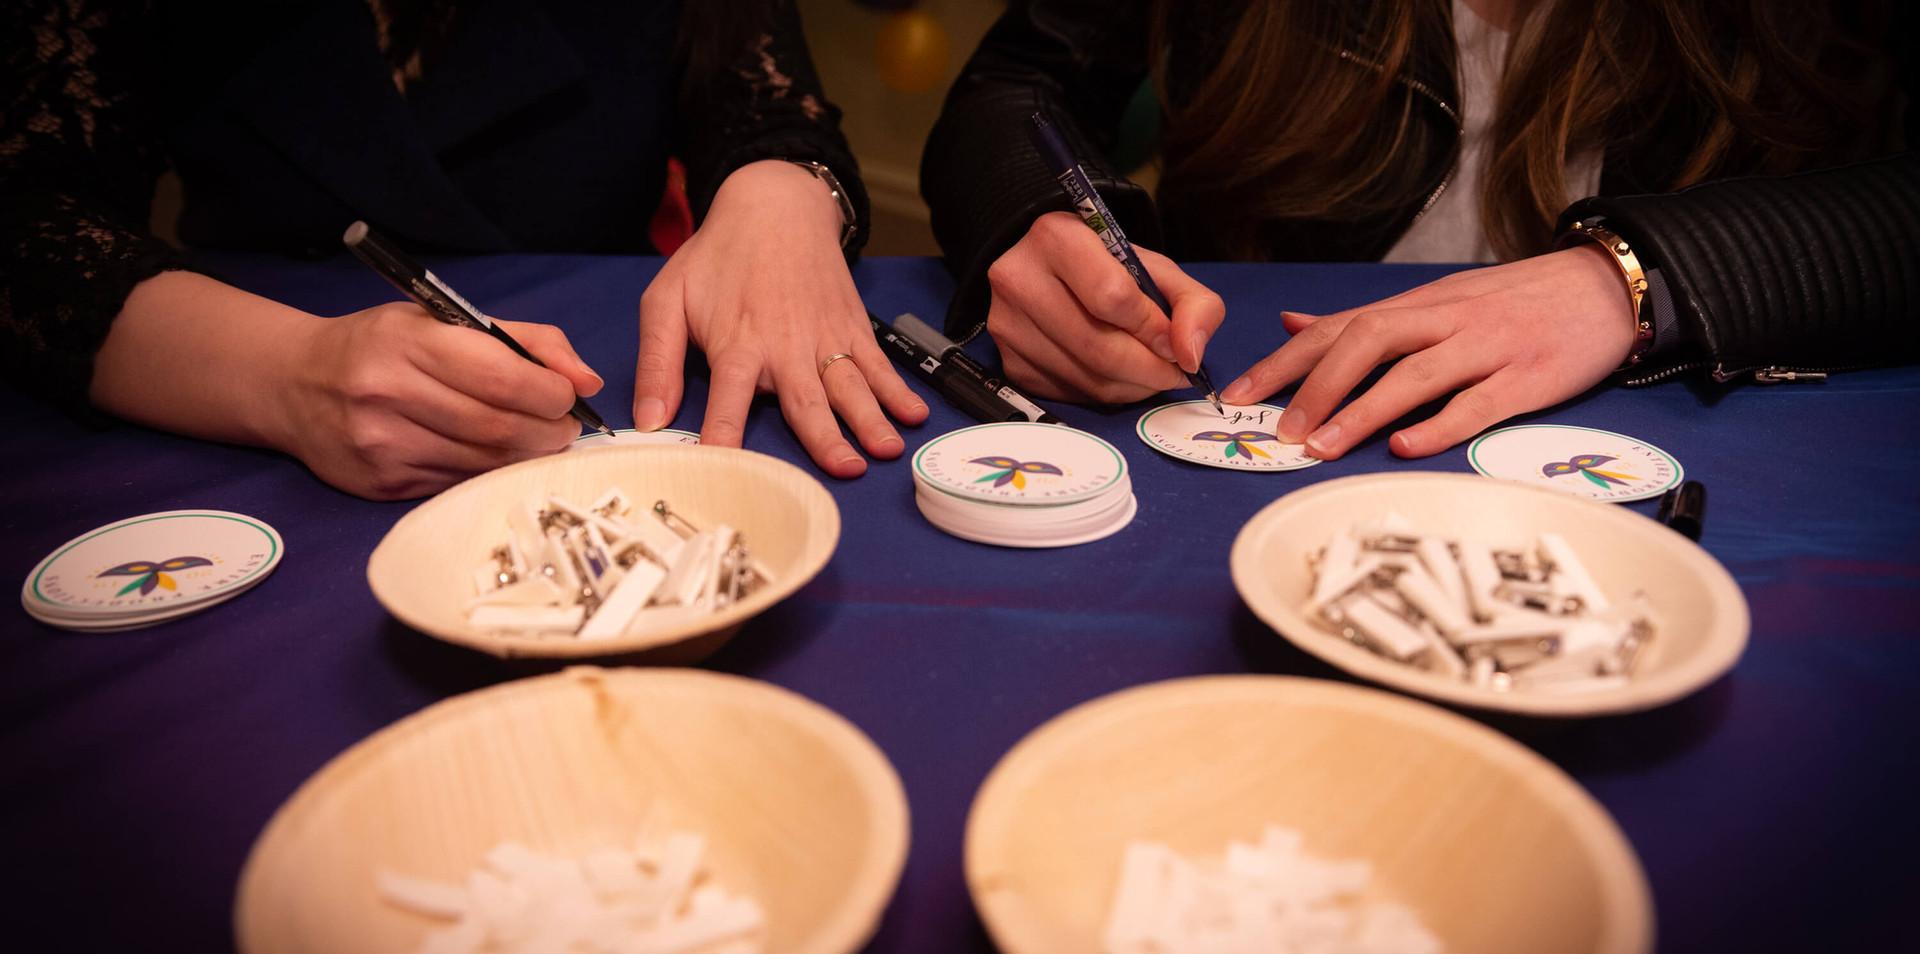 onsite-calligraphy-event-san-francisco.j